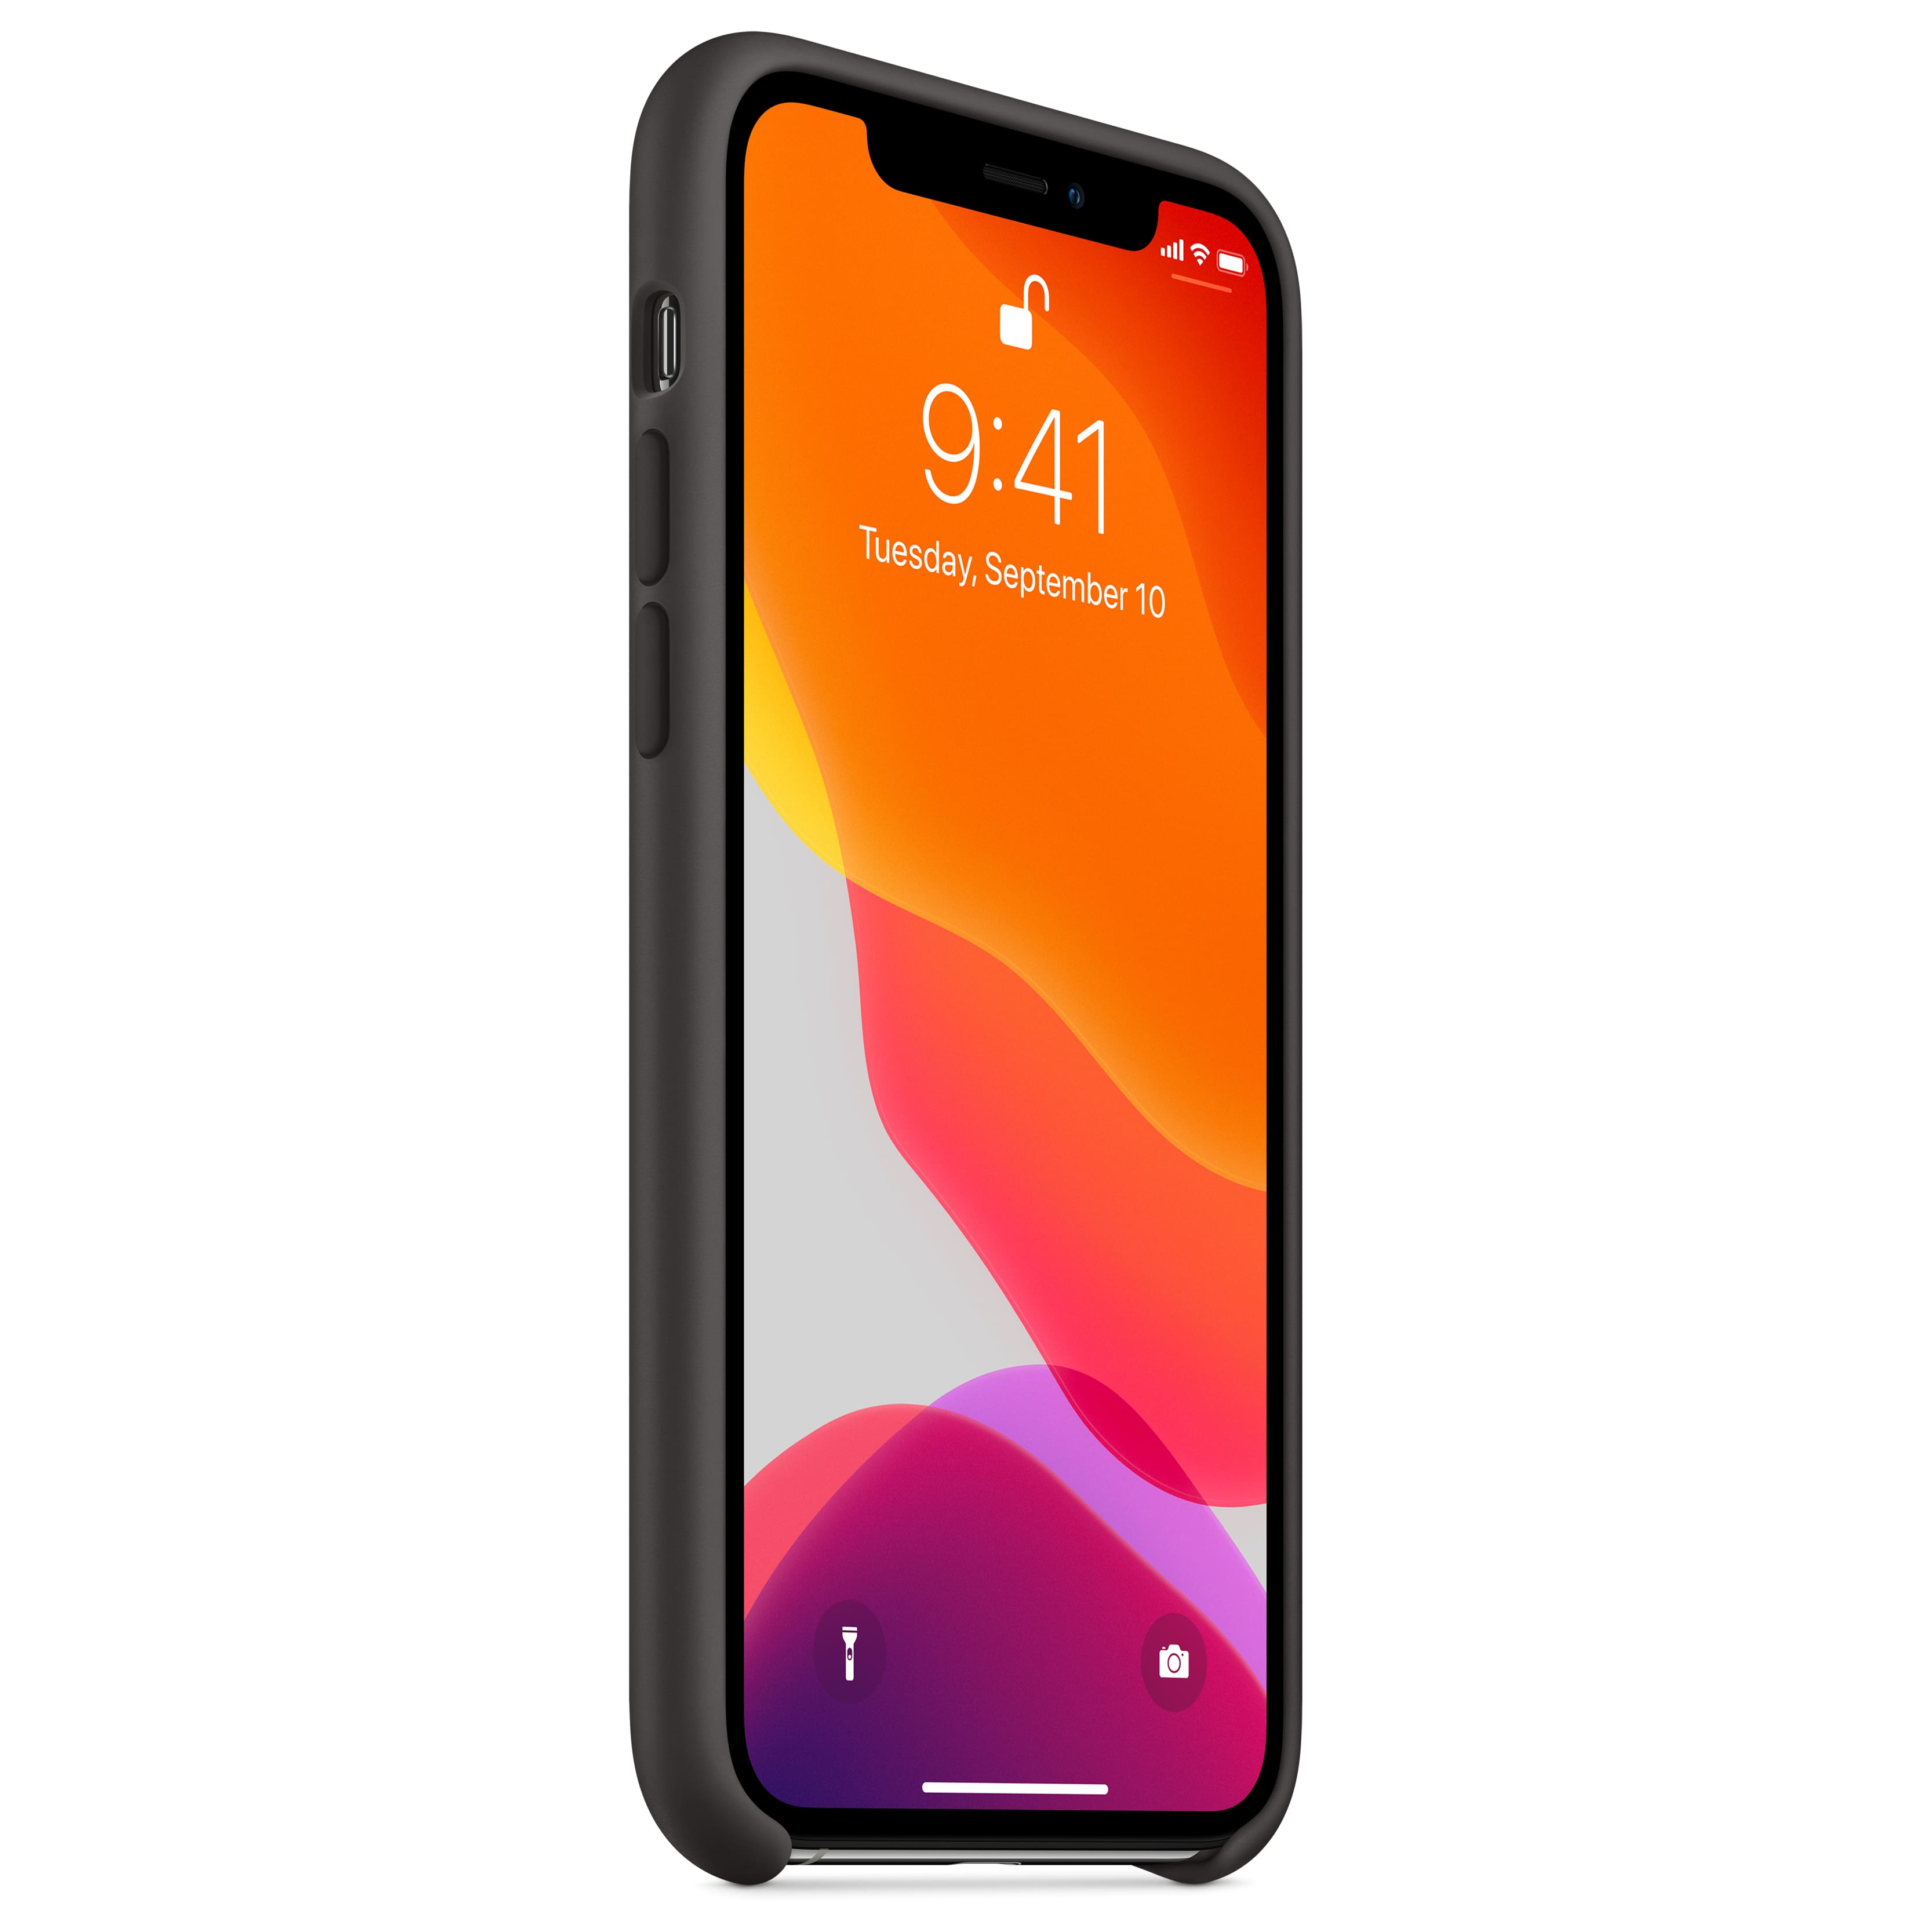 Apple iPhone Silicone Case: iPhone 11 (White) $13.15, iPhone 11 Pro (Black)